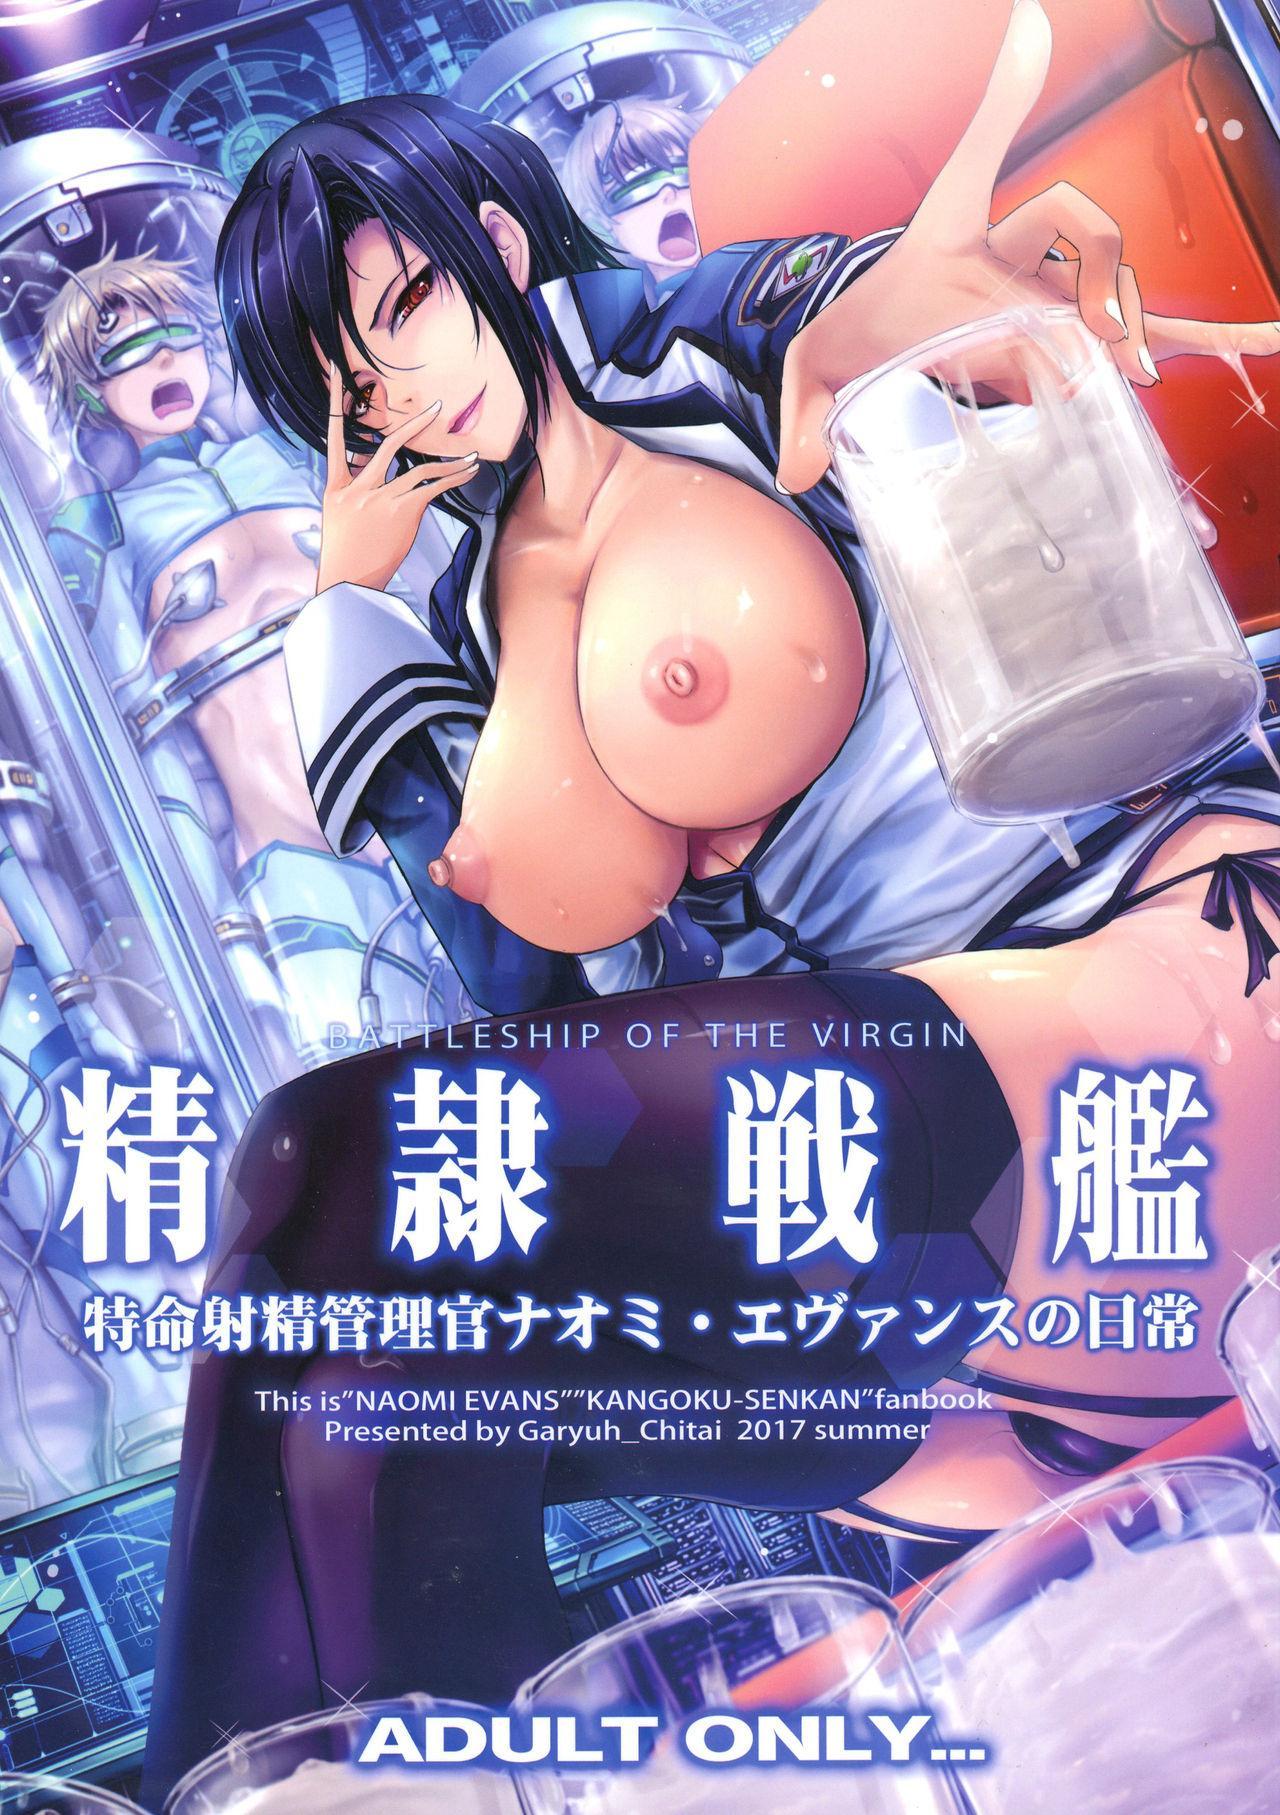 Seirei Senkan Tokumei Shasei Kanri-kan Naomi Evans no Nichijou 0